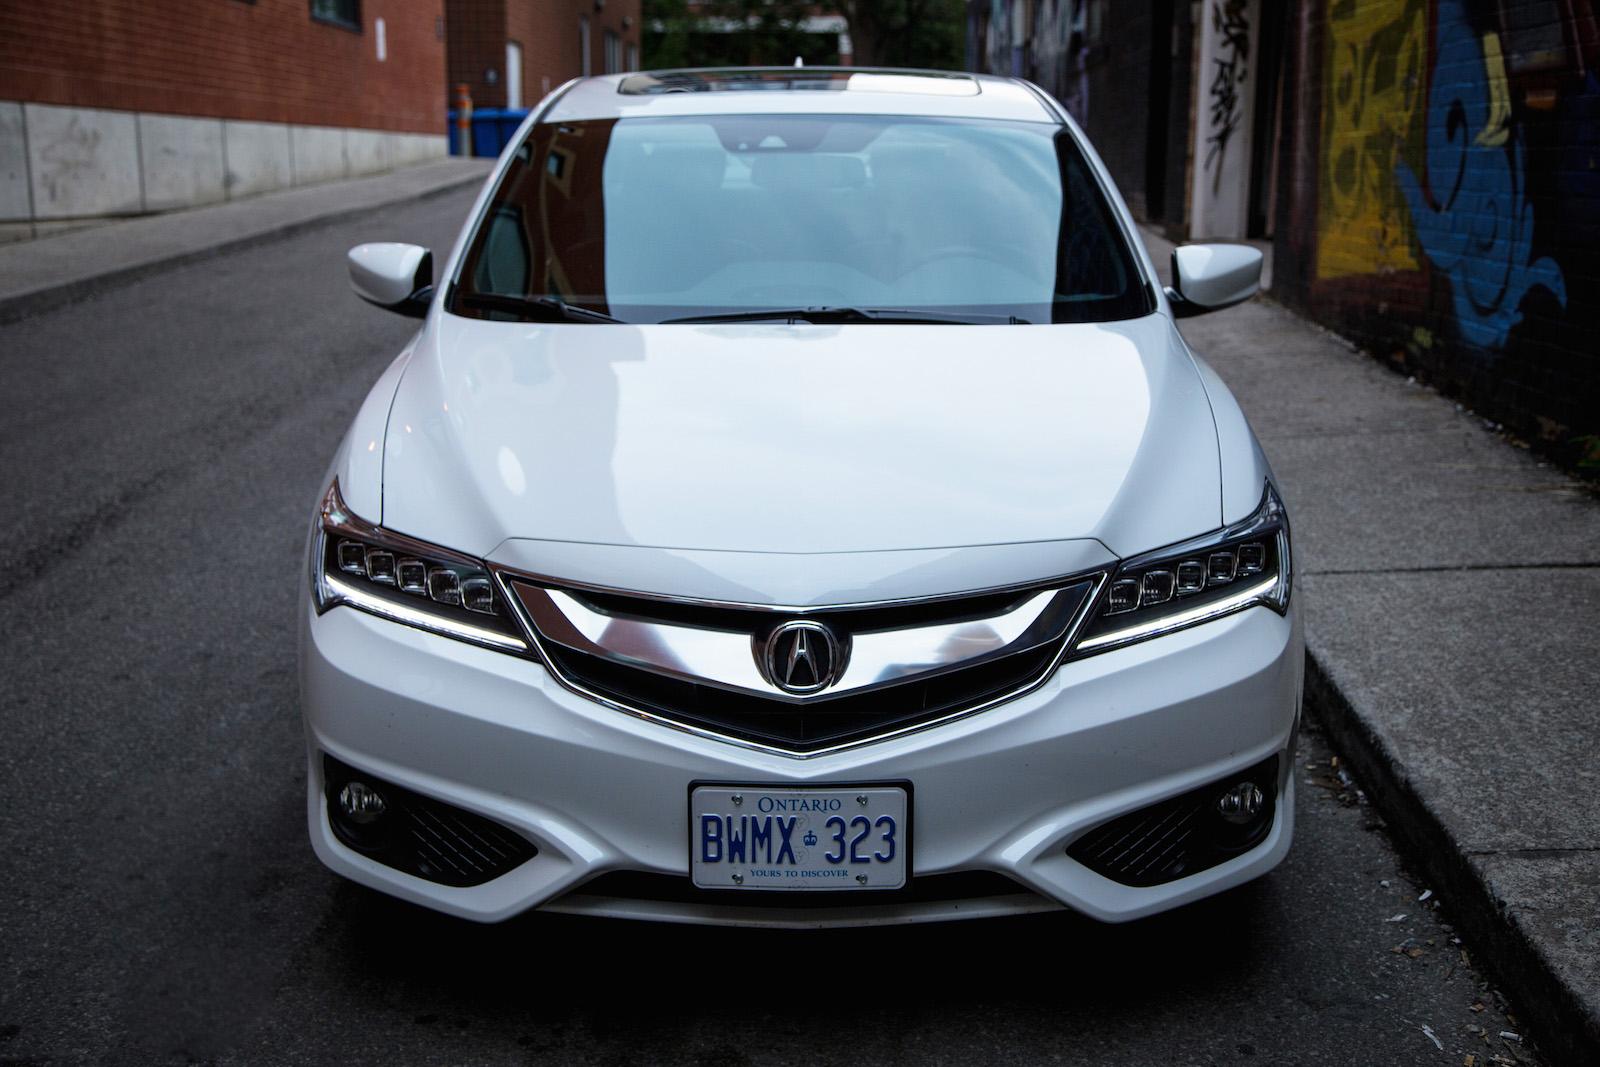 Review: 2016 Acura ILX A-Spec